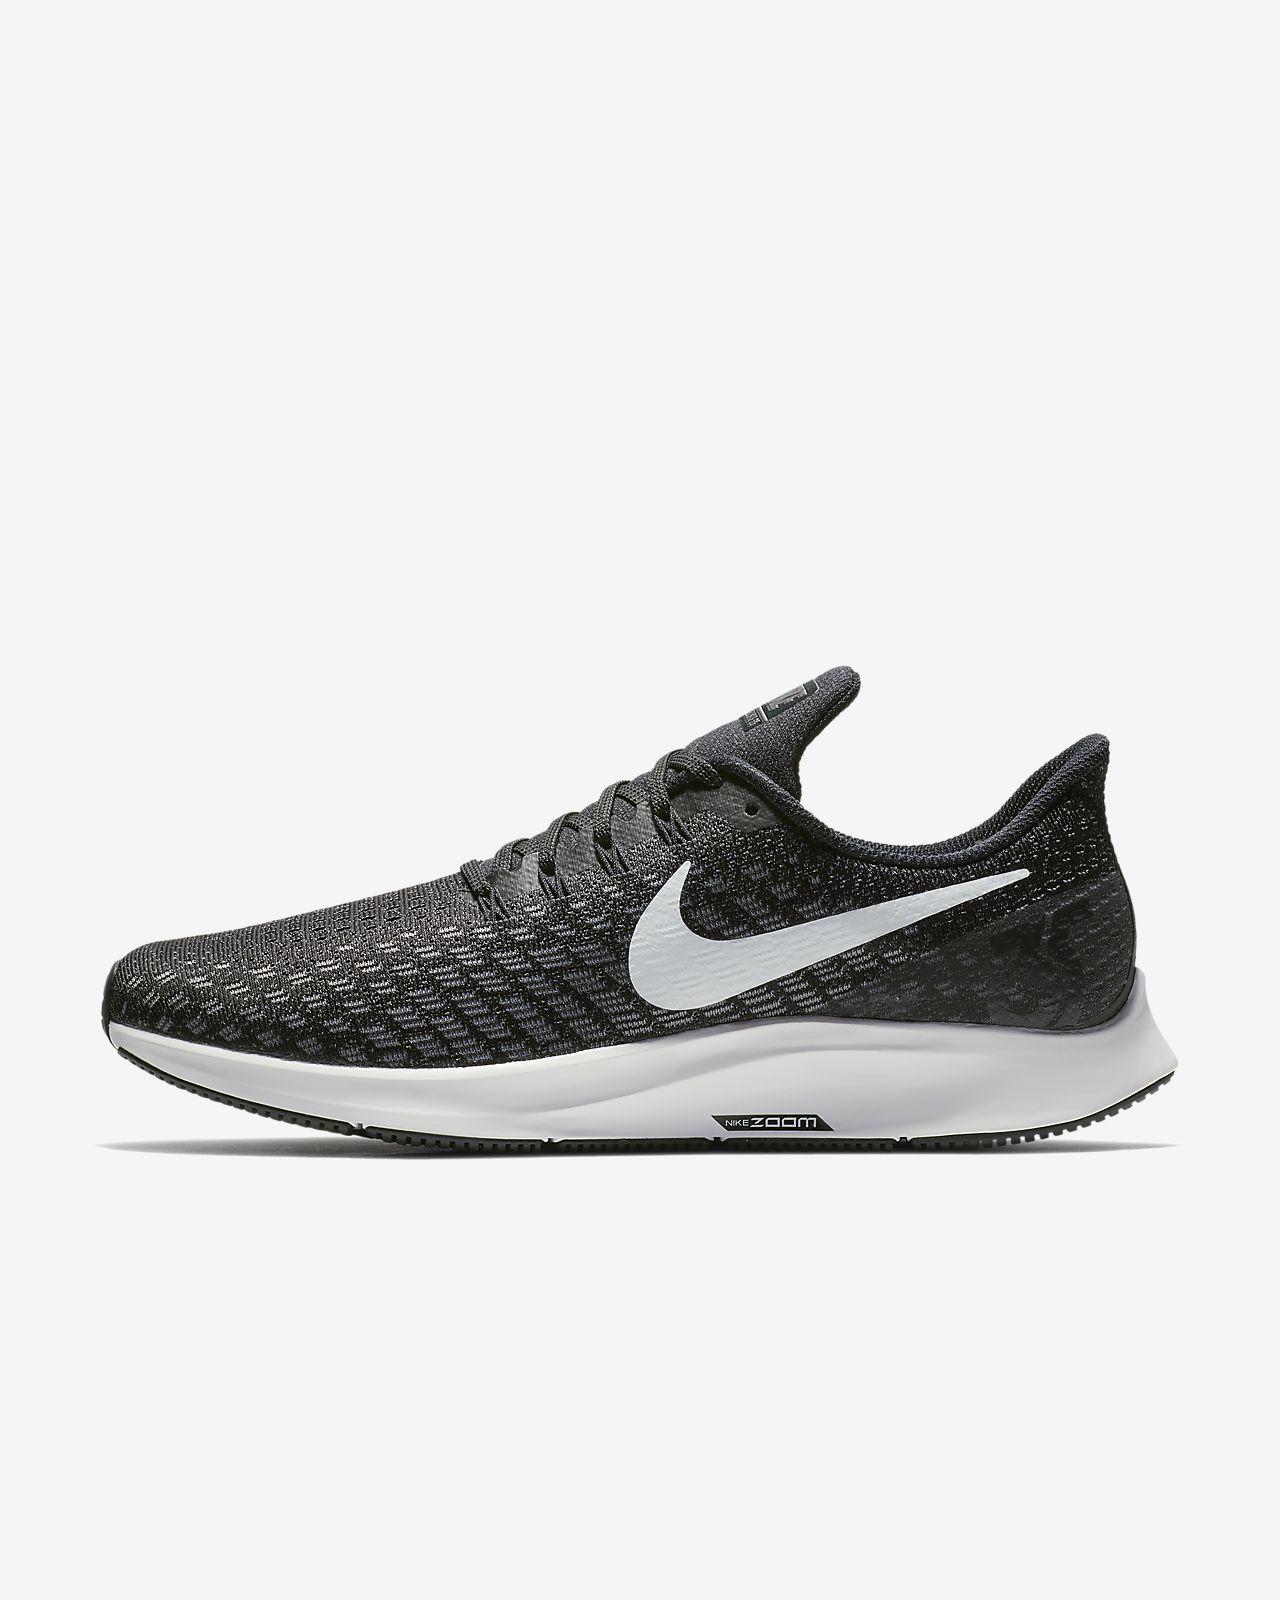 rebanada Cabecear Estadio  Nike Air Zoom Pegasus 35 (Extra Wide) Men's Running Shoe. Nike.com |  Running shoes for men, Nike air zoom pegasus, Black running shoes